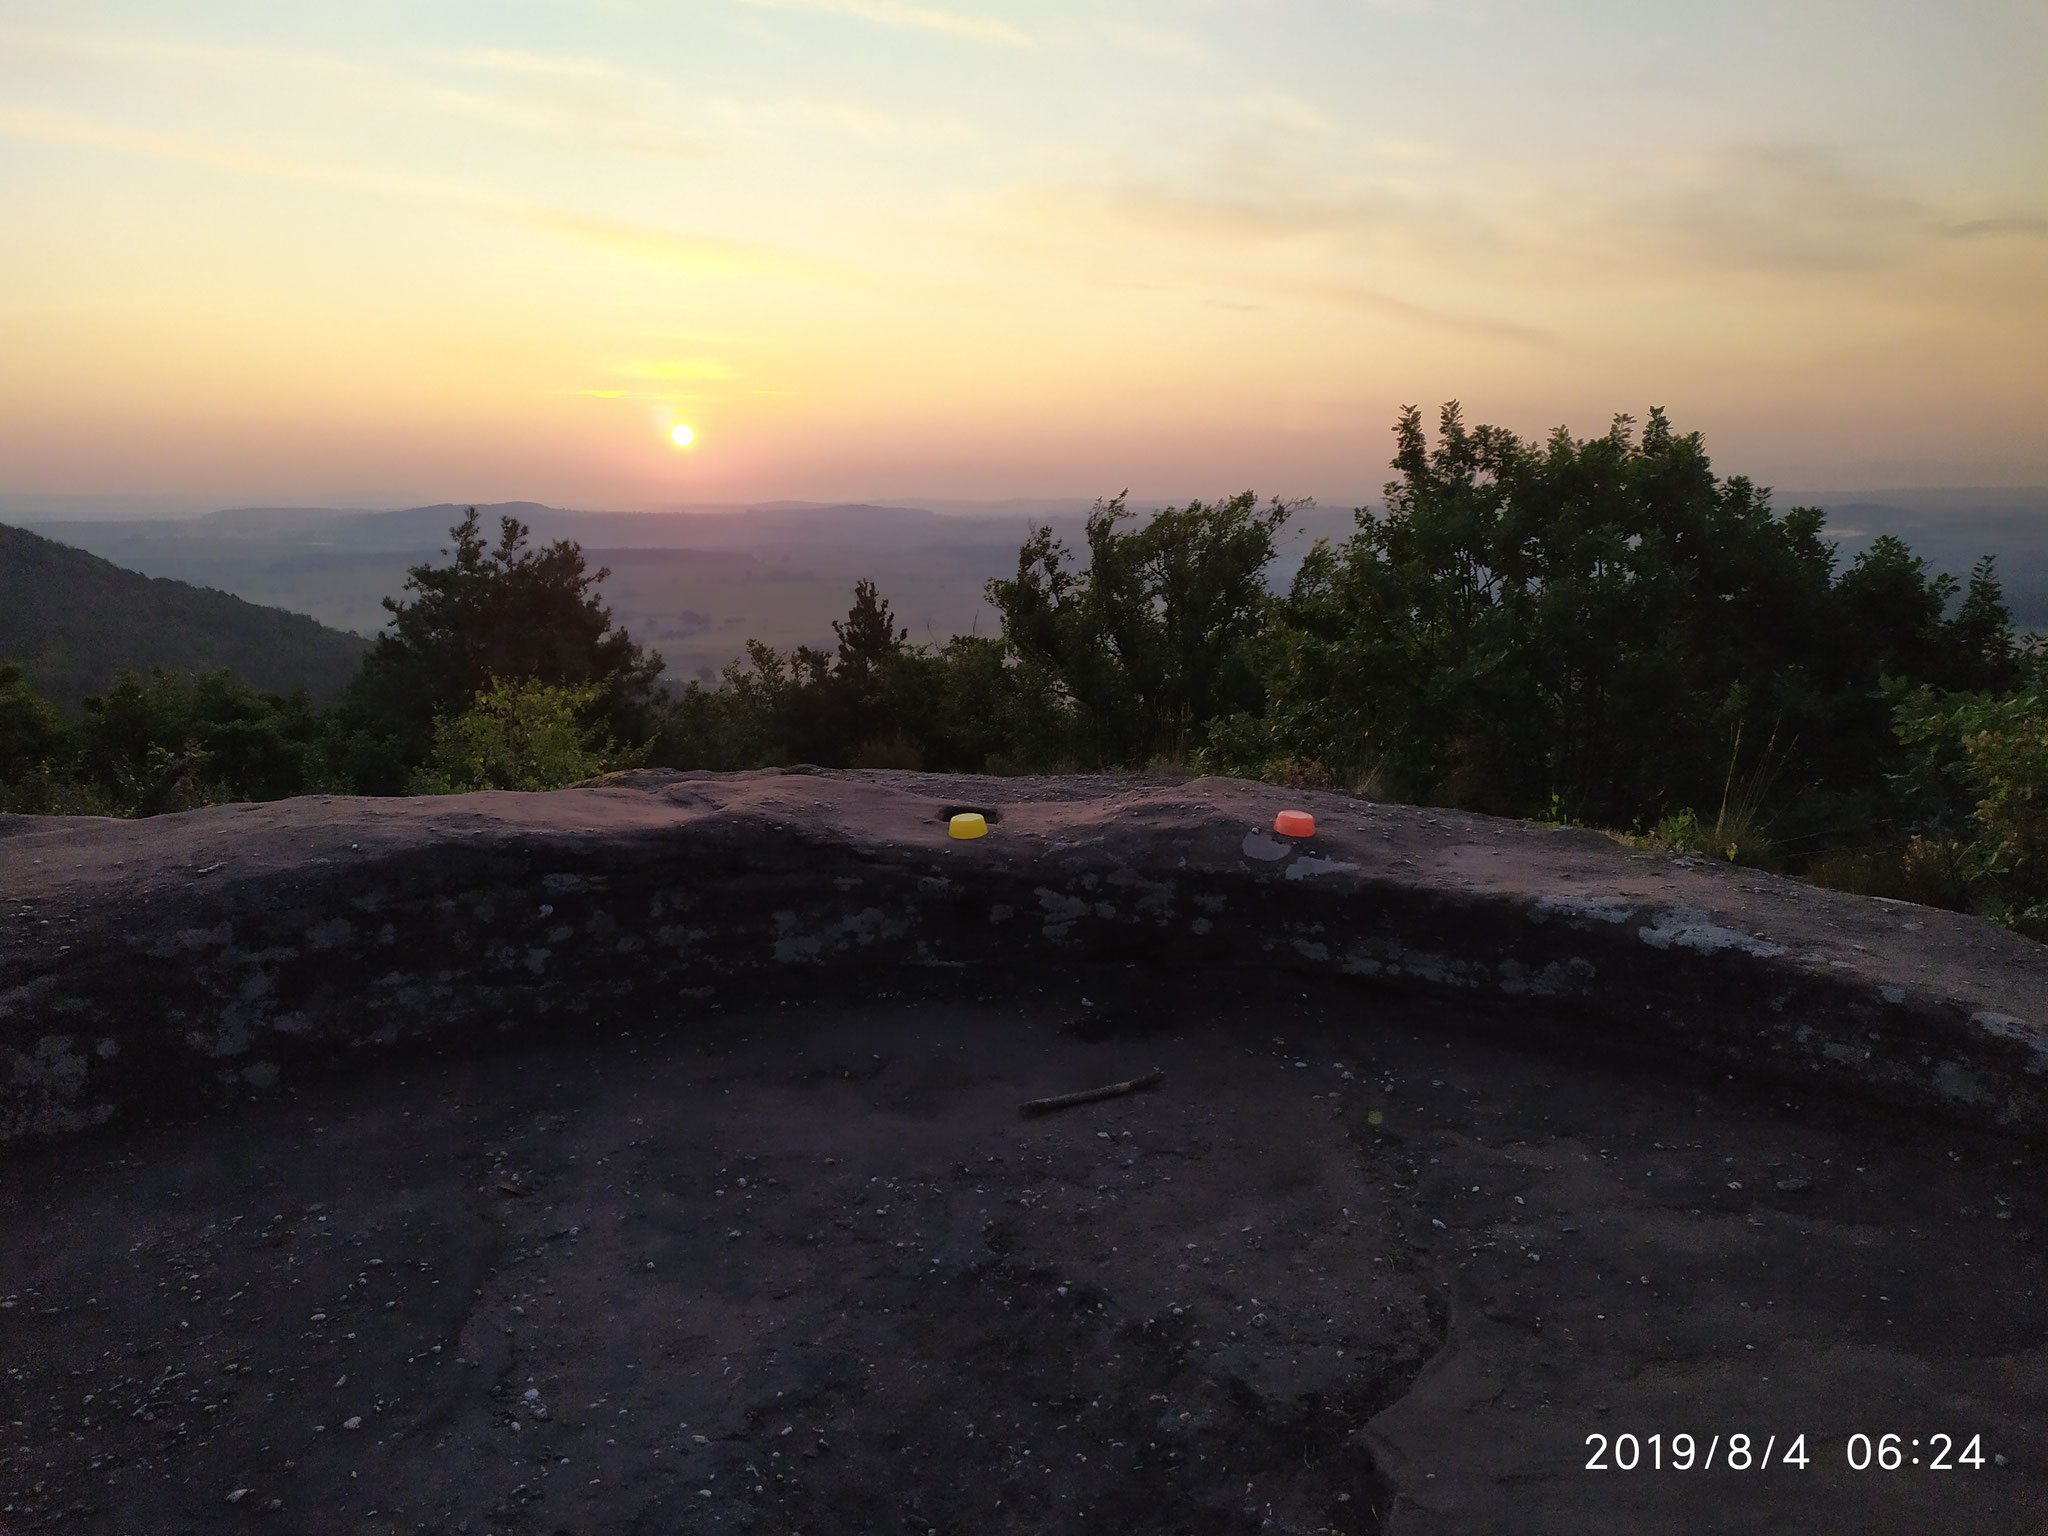 Beim Sonnenaufgang